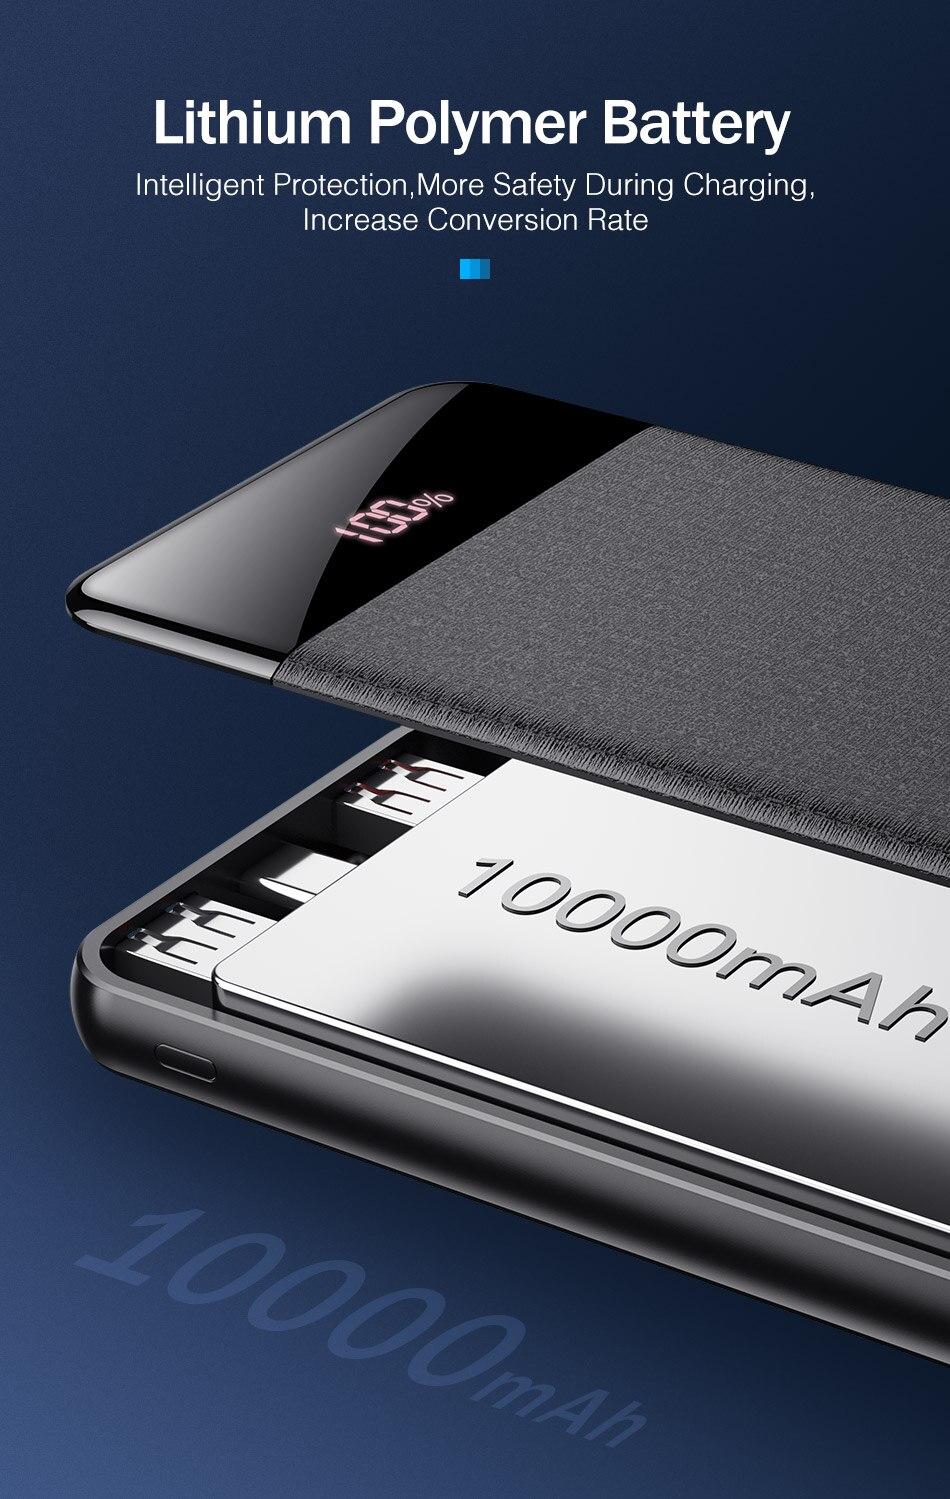 YKZ QC 3,0 внешний аккумулятор 10000 мАч светодиодный портативный аккумулятор PD Быстрая зарядка 12 В внешний аккумулятор для iPhone Xiaomi Mi с USB